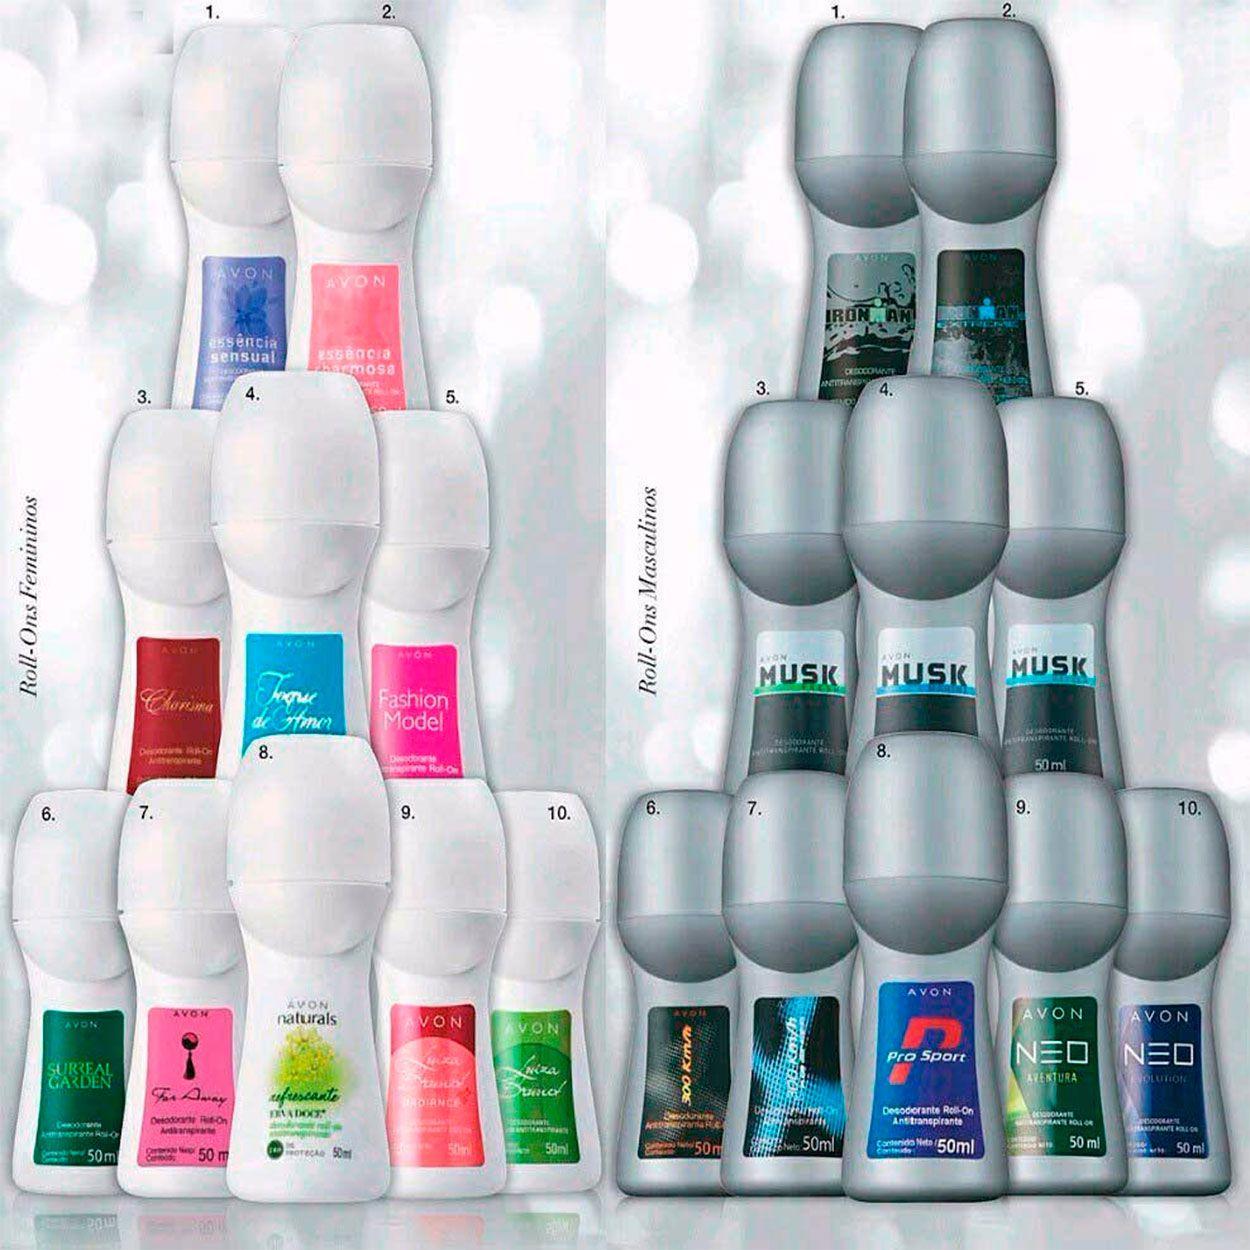 Desodorante Roll-on Masculino Ou Feminino Avon 3 unidades